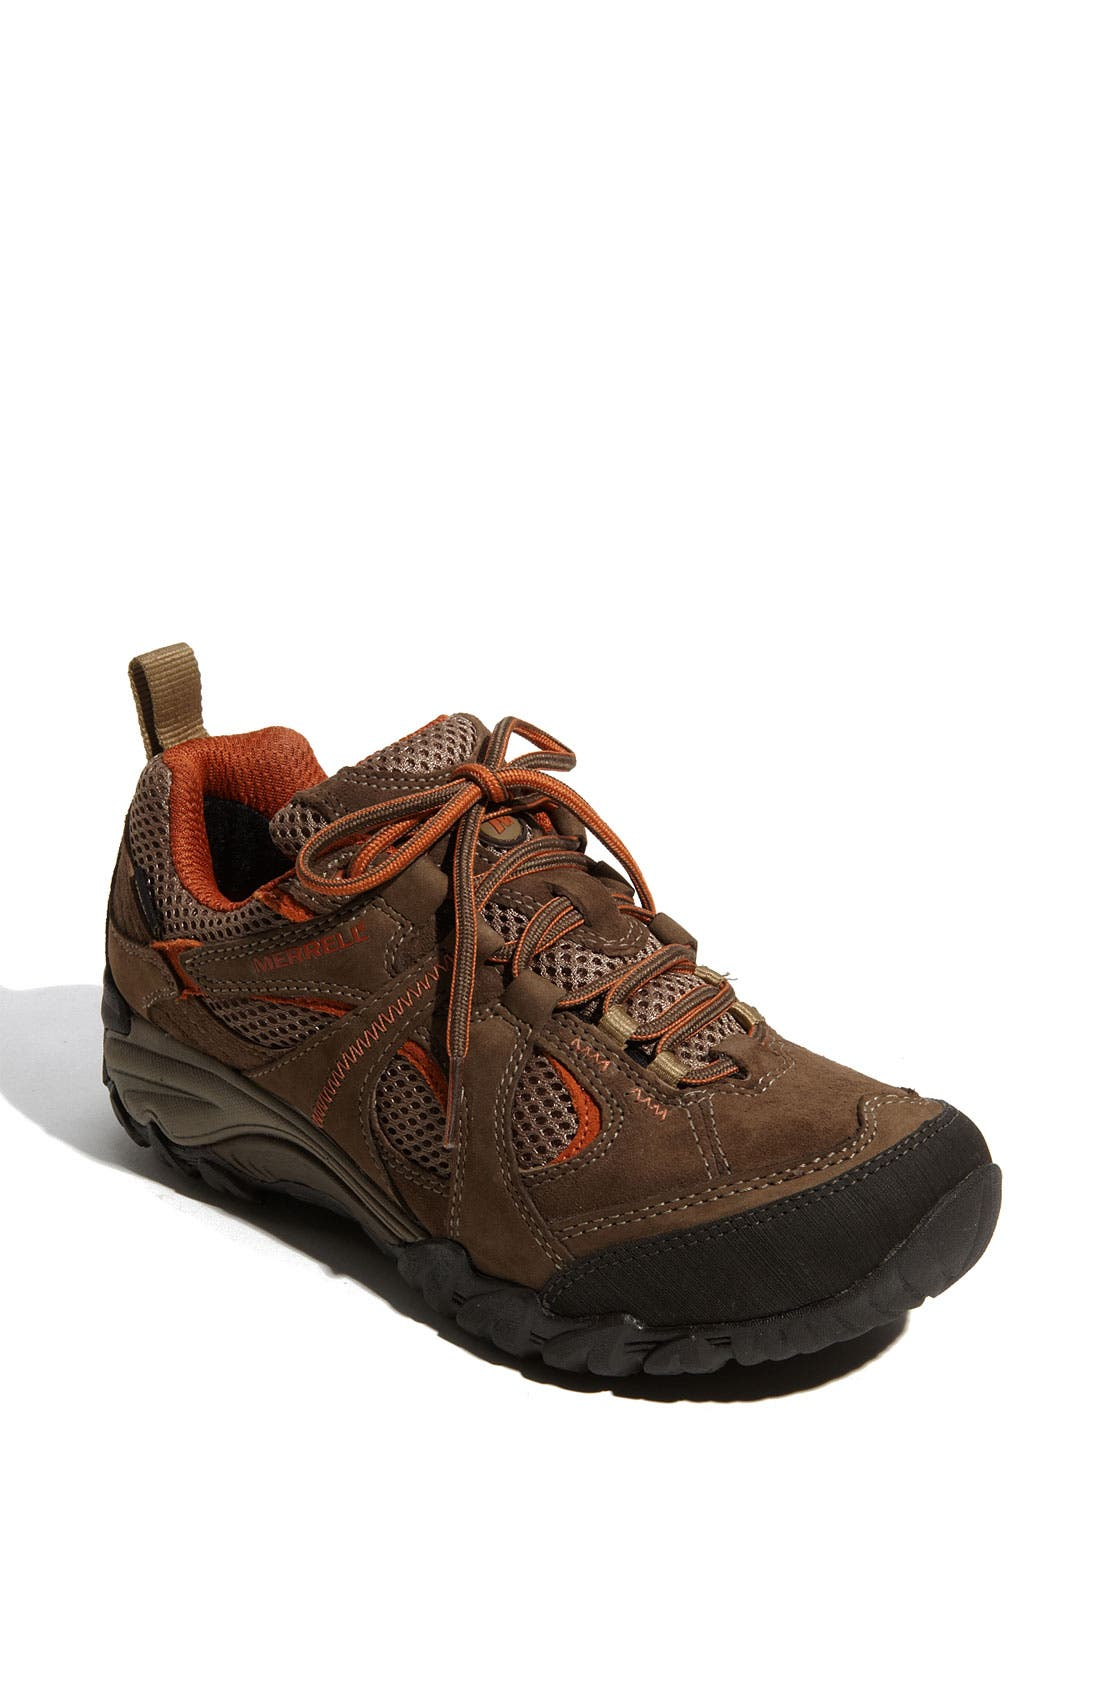 Alternate Image 1 Selected - Merrell 'Chameleon Arc 2 Wind' Gore-Tex® Walking Shoe (Women)